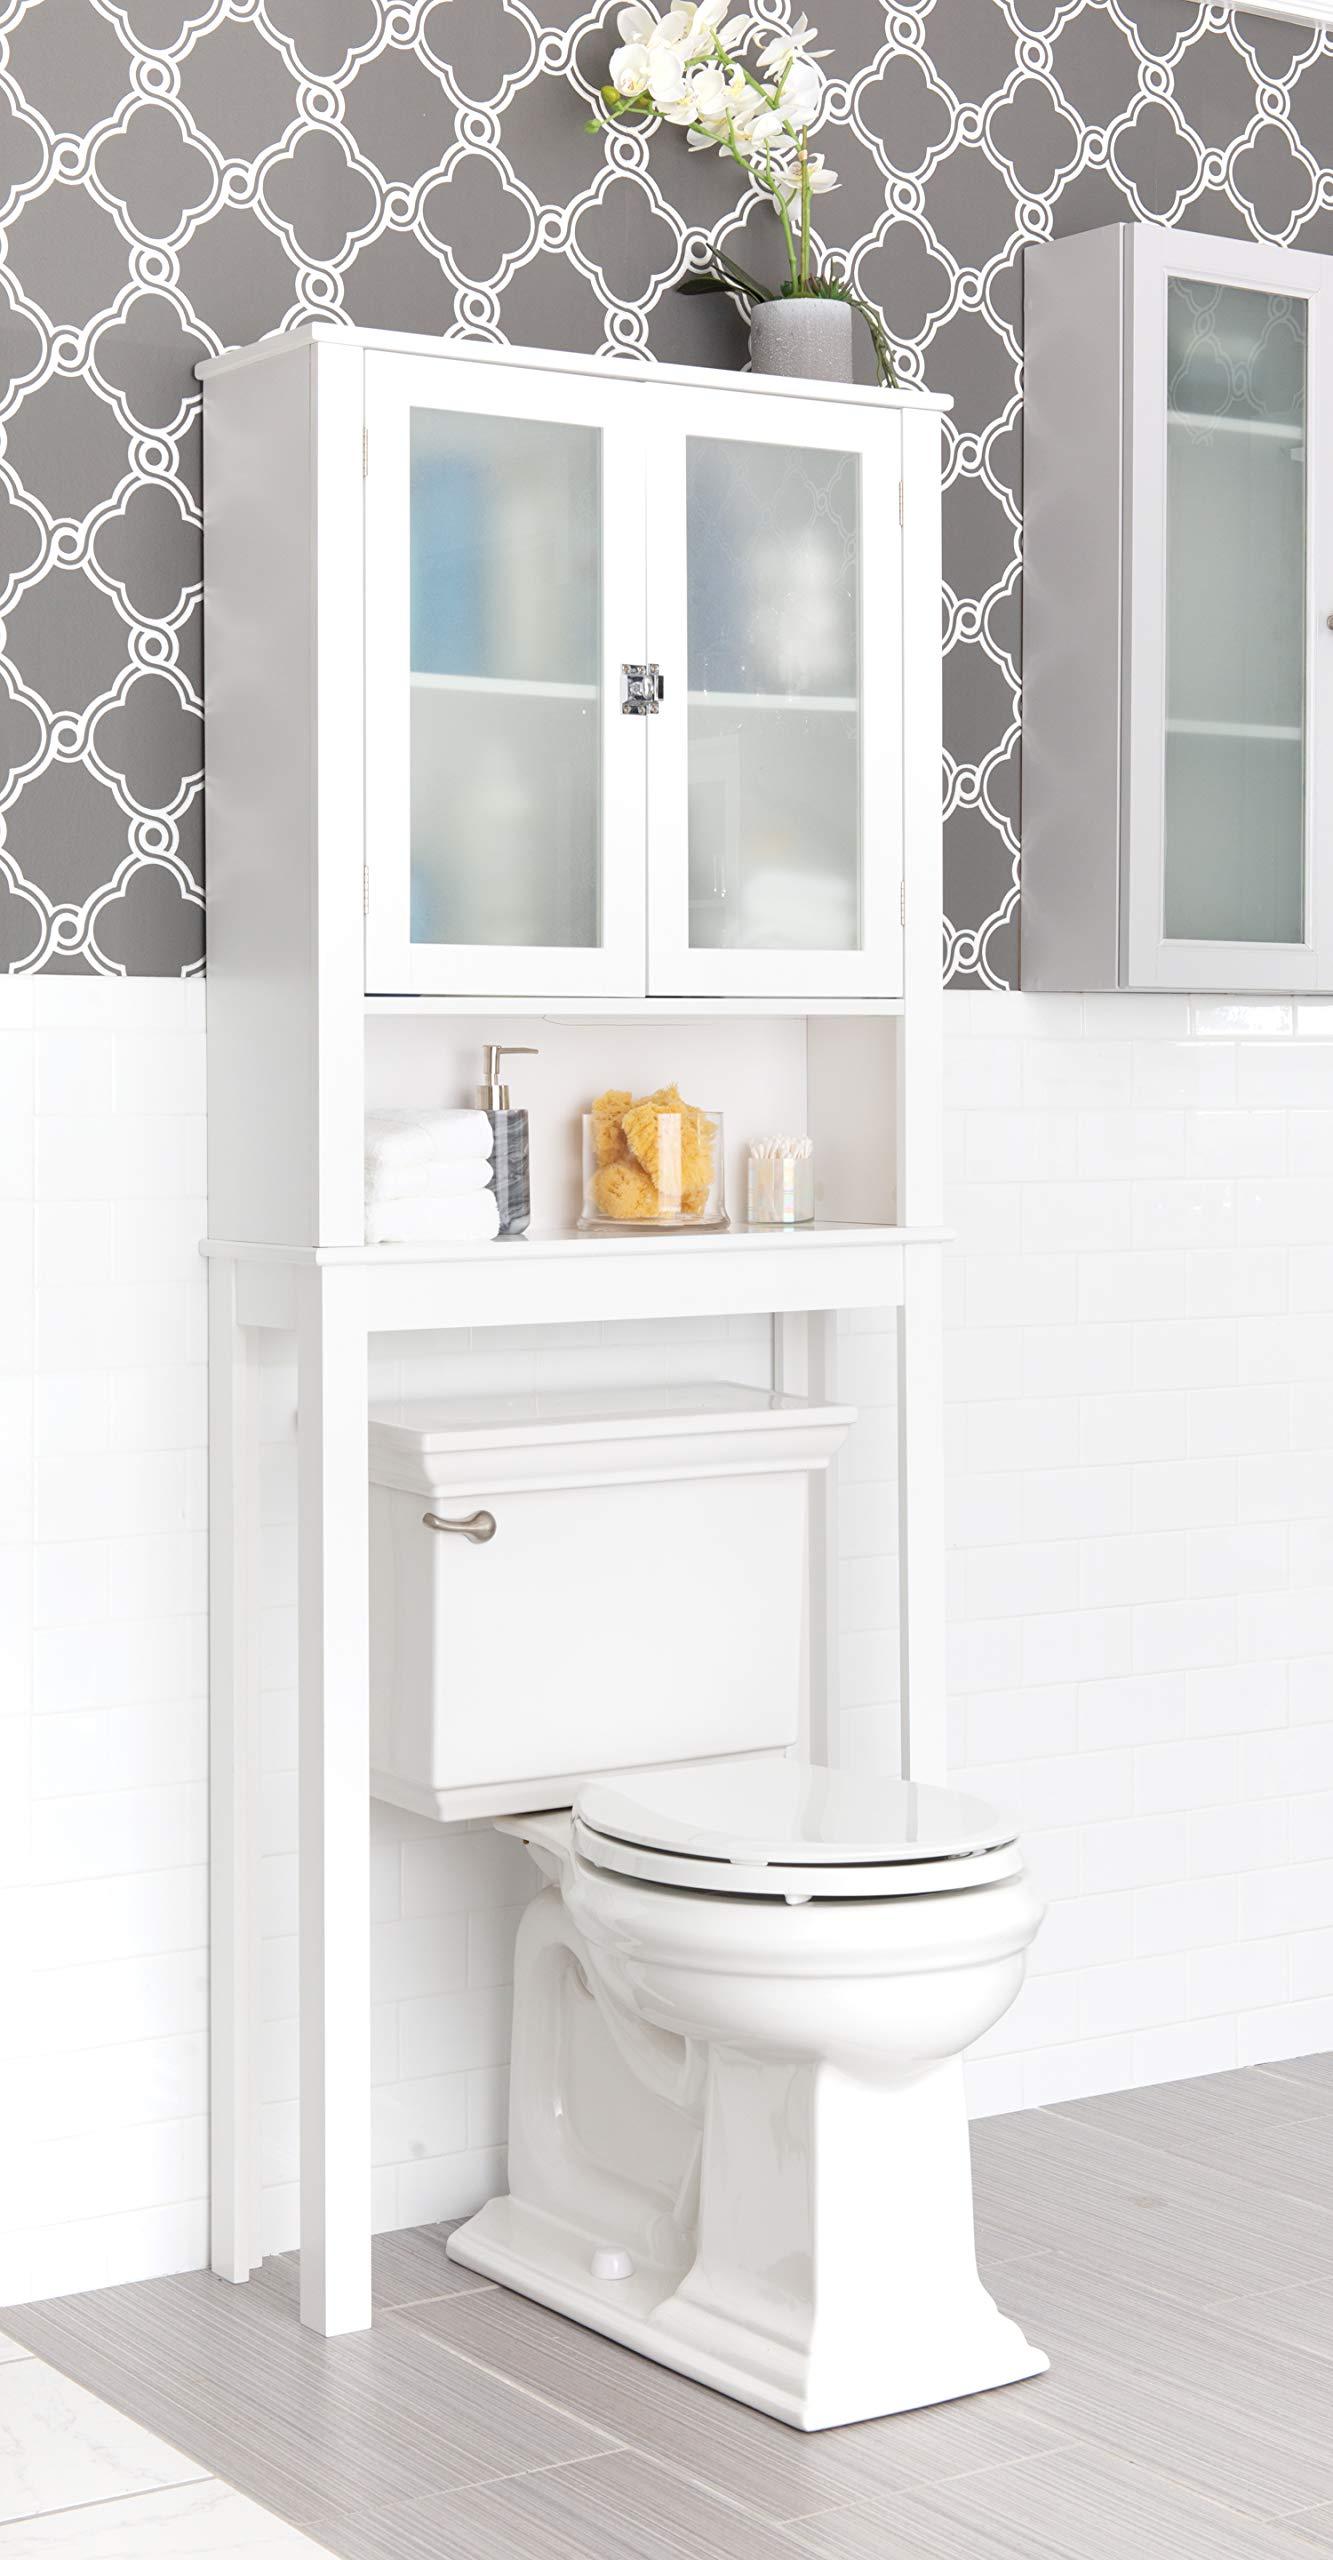 Zenna Home Classic bathroom spacesaver, White by Zenna Home